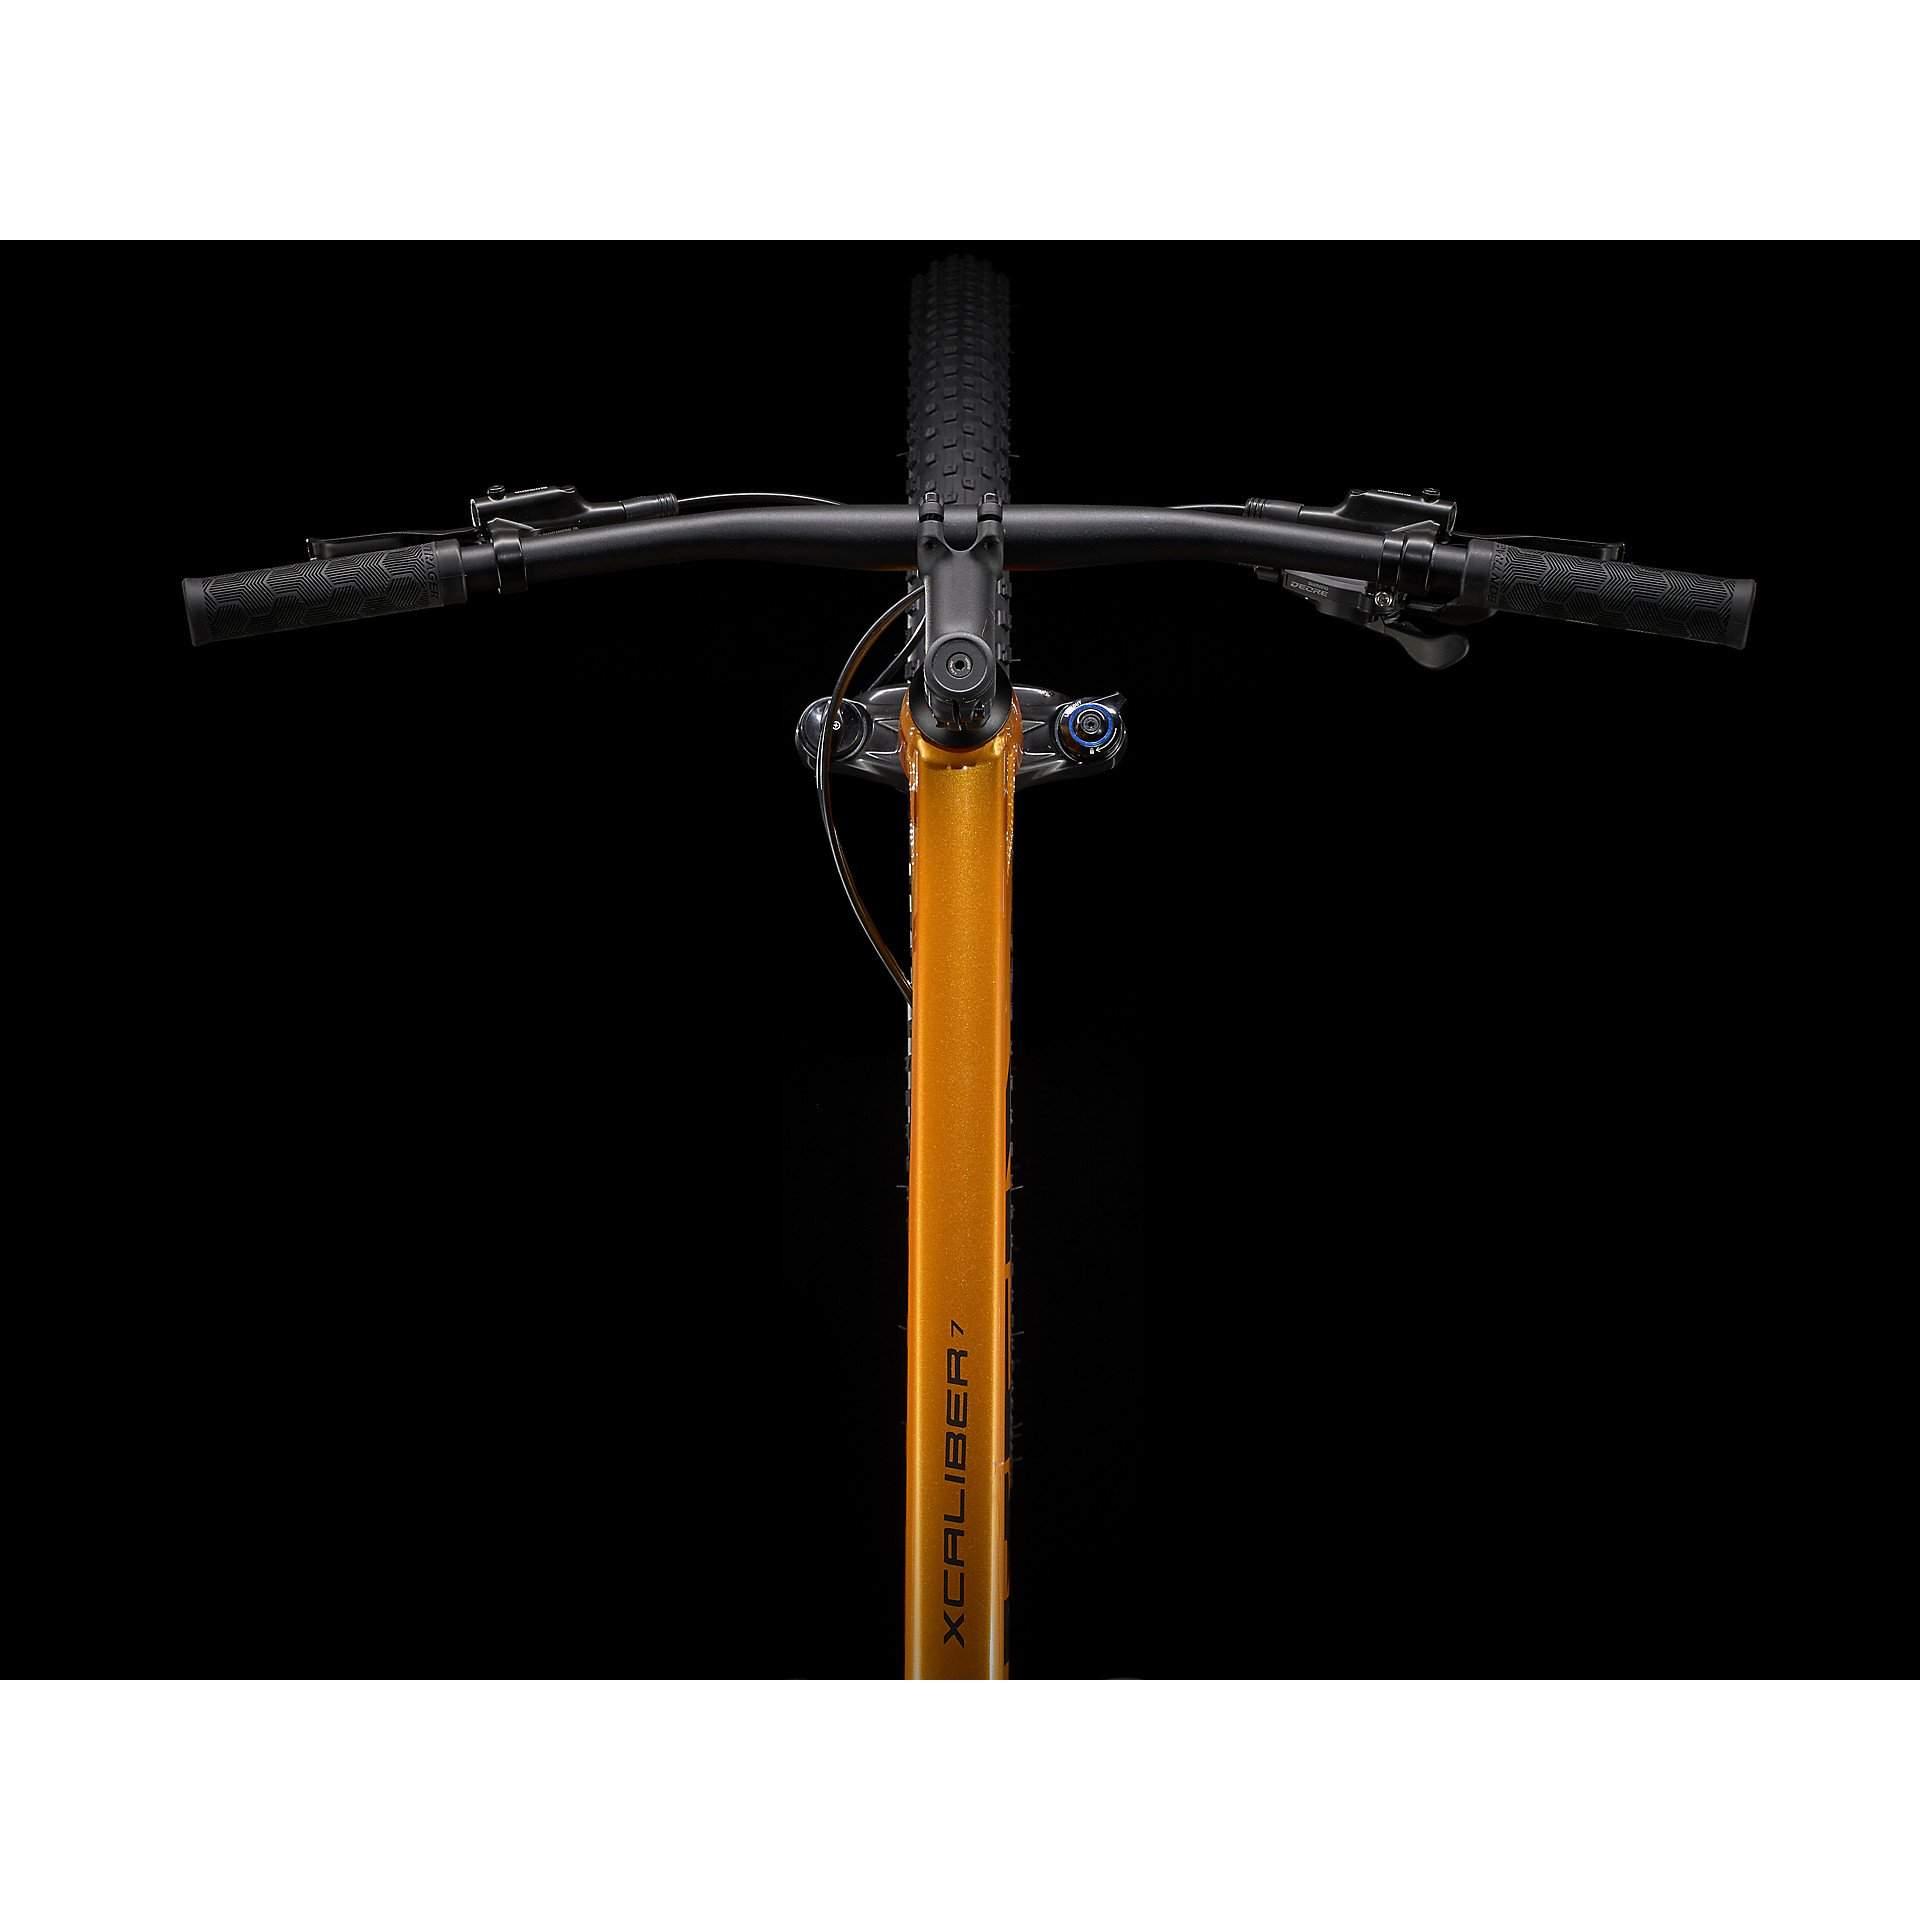 ROWER TREK X-CALIBER 7 FACTORY ORANGE|LITHIUM GREY 92